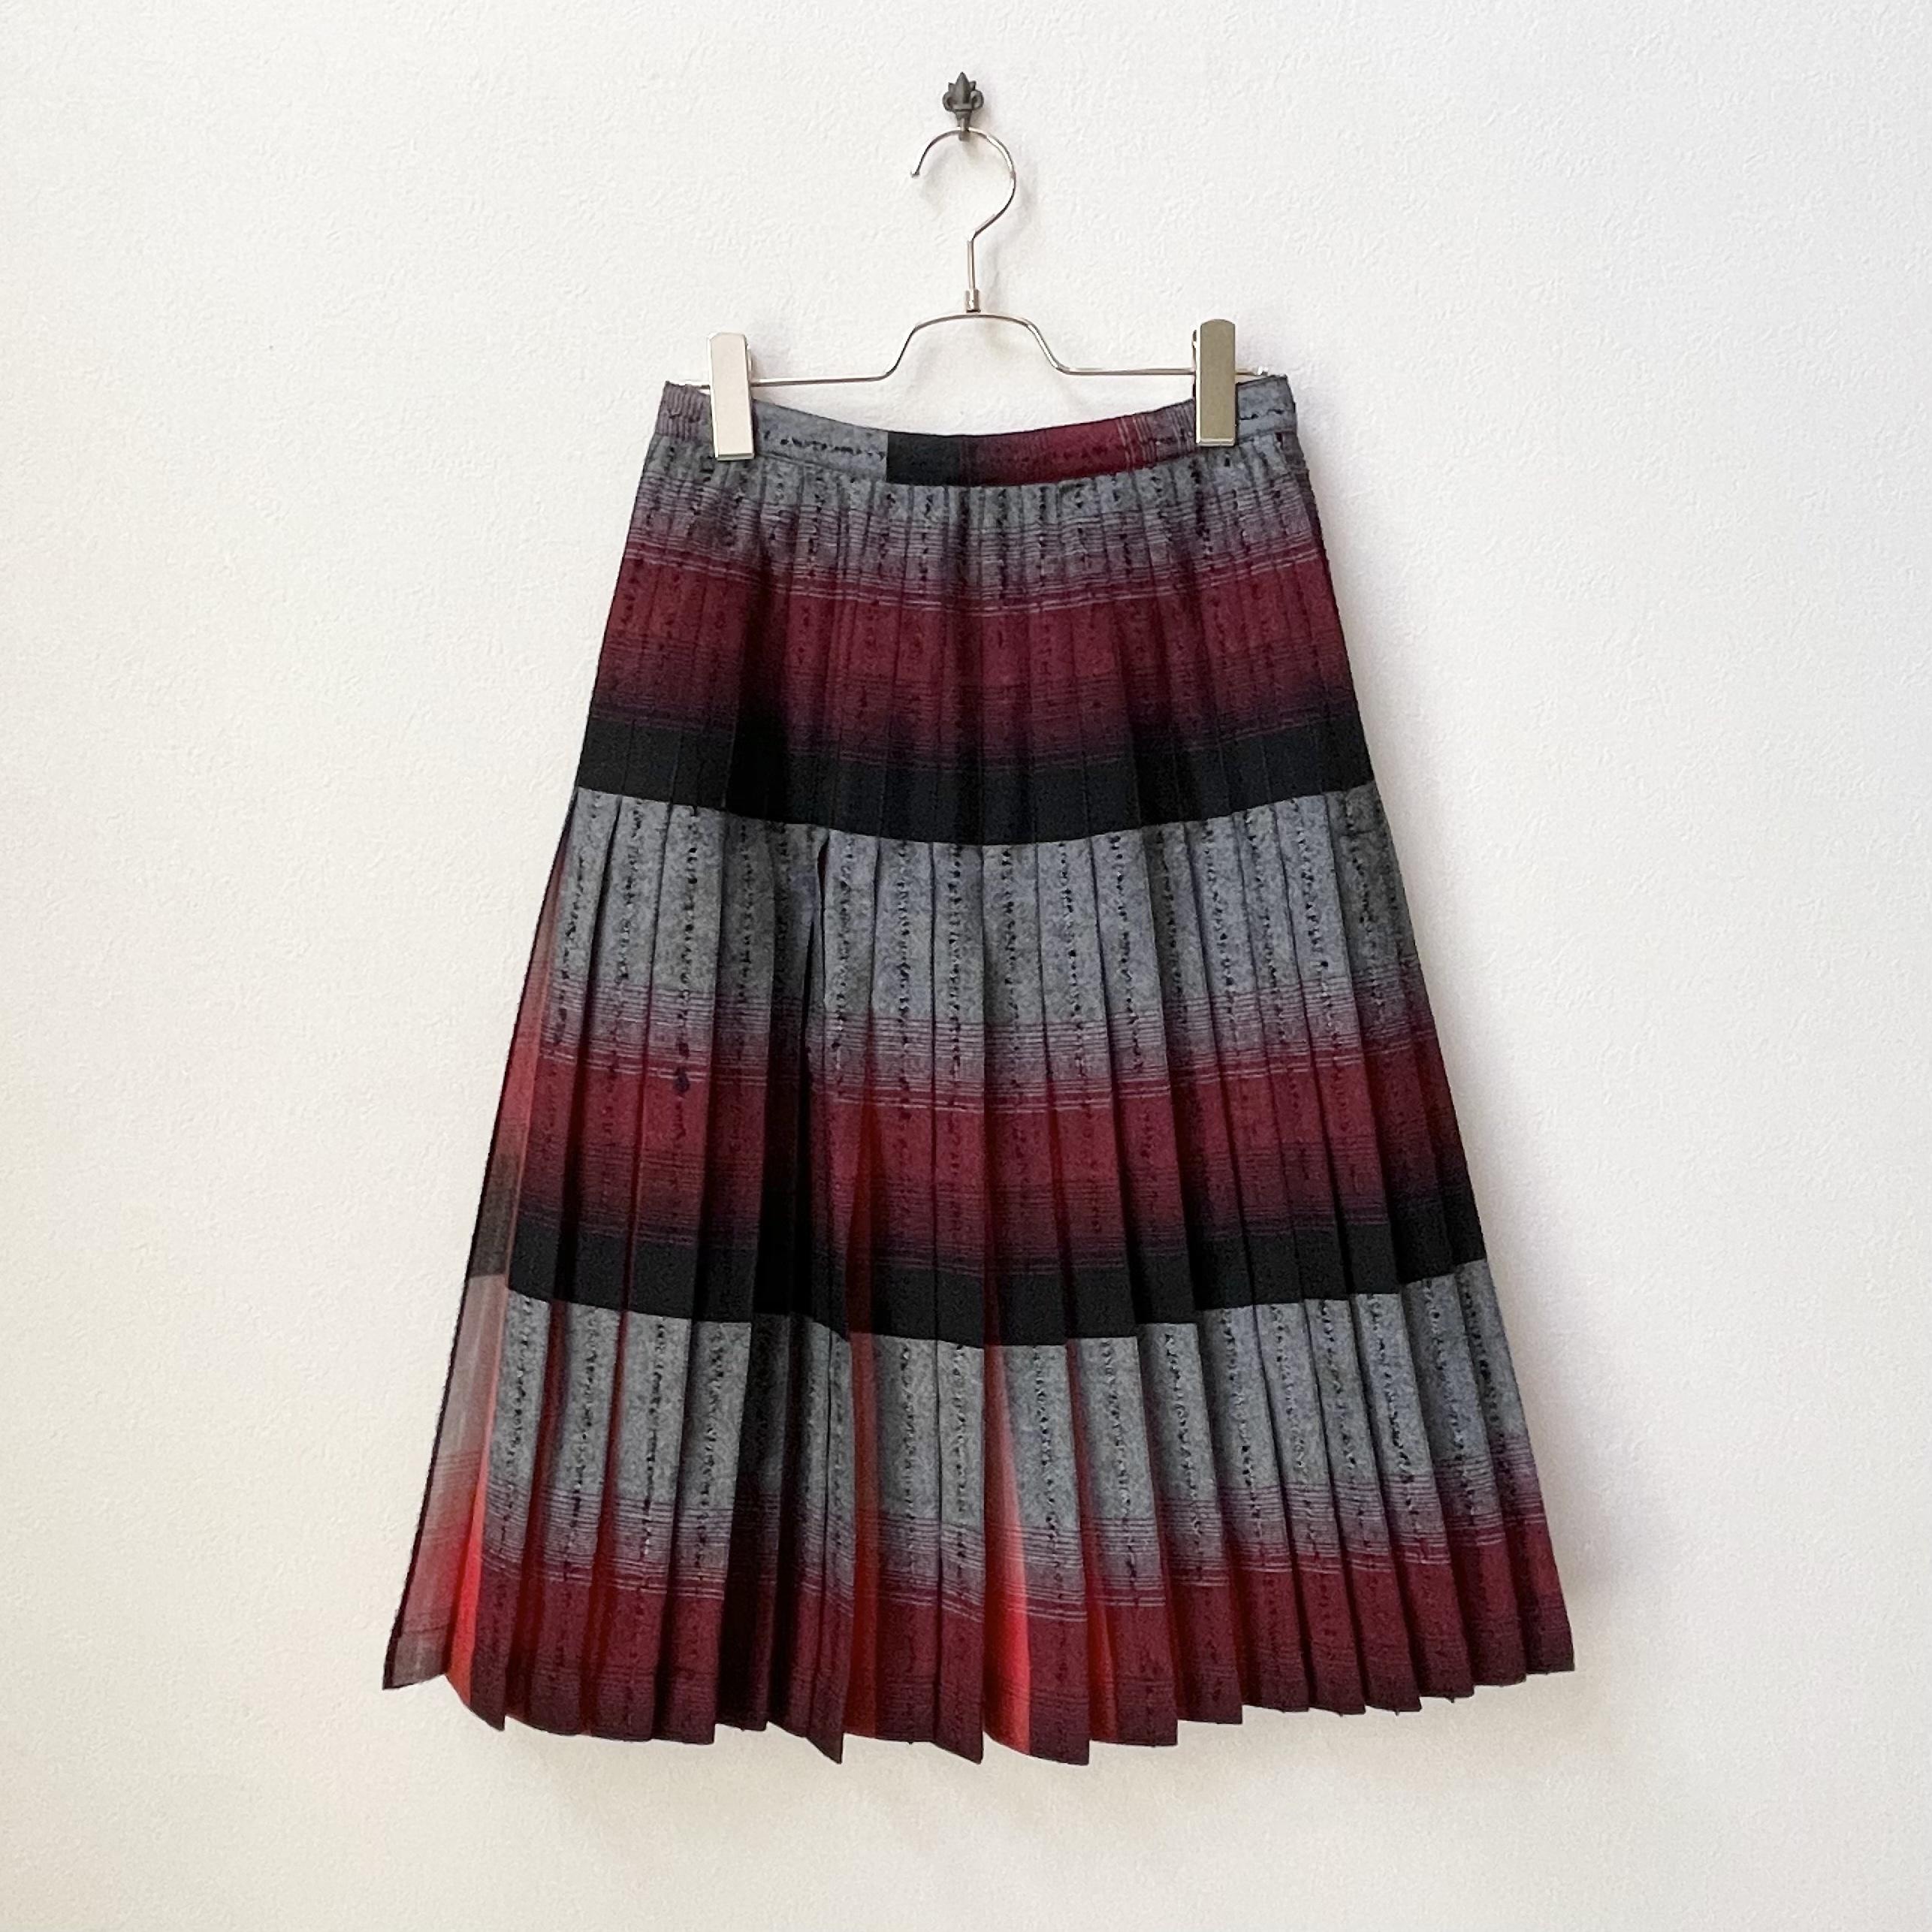 Highland Queen 60年代 CANADA製 ヴィンテージ ウール プリーツスカート アメリカ 古着 日本M〜L